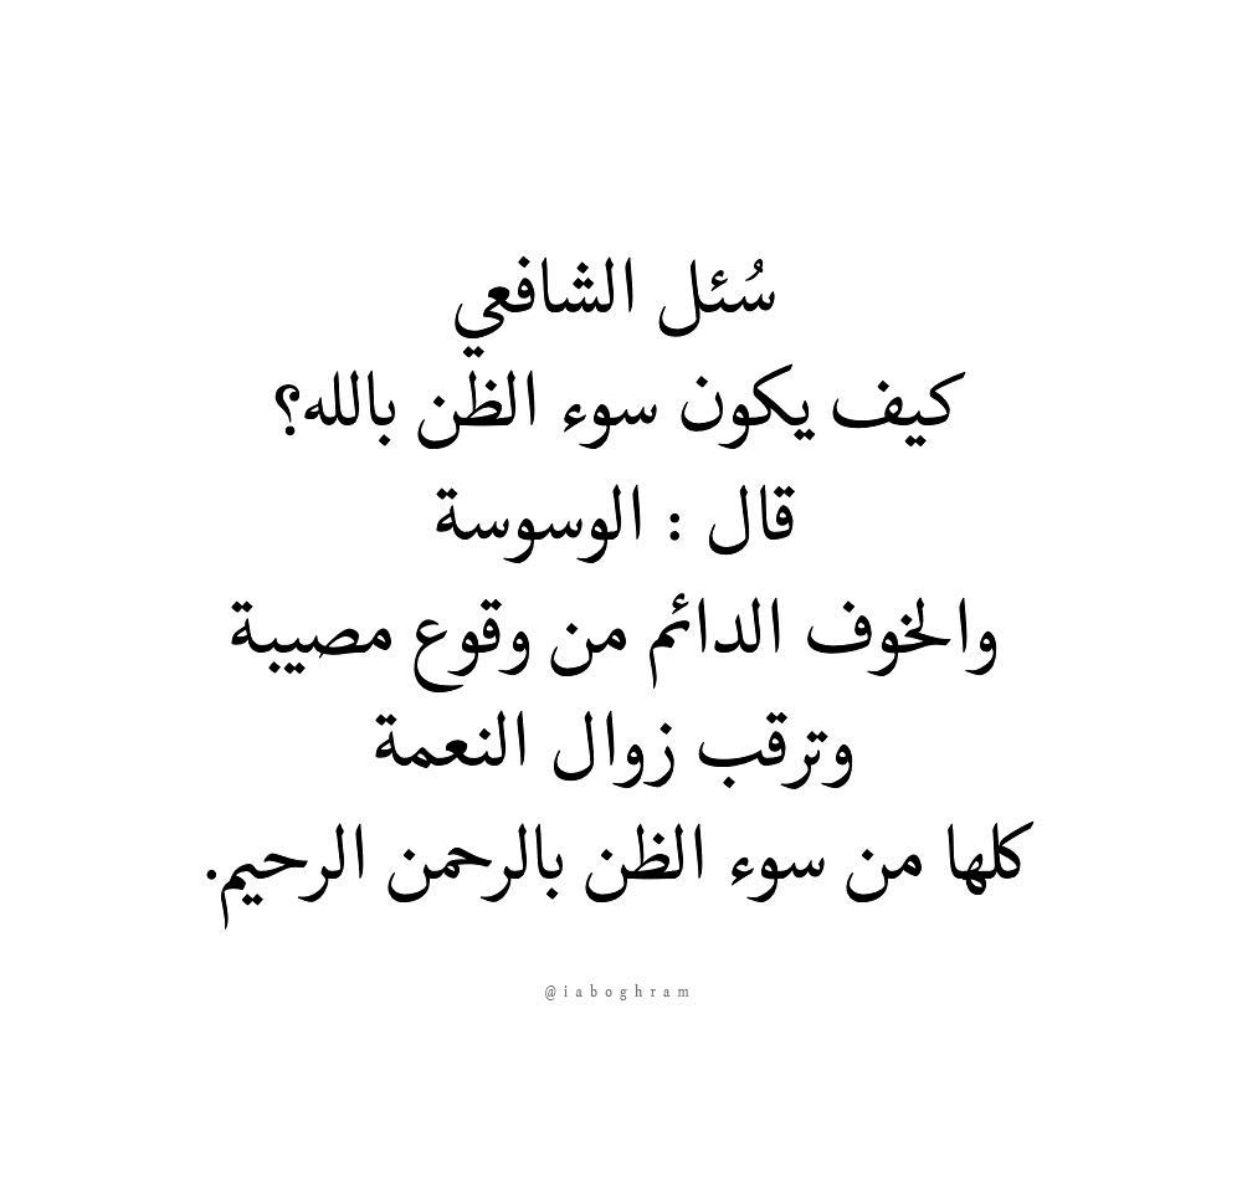 Pin By Alaa Erfan On الرضا الحمد لله الصبر عند البلاء In 2020 Calligraphy Arabic Calligraphy